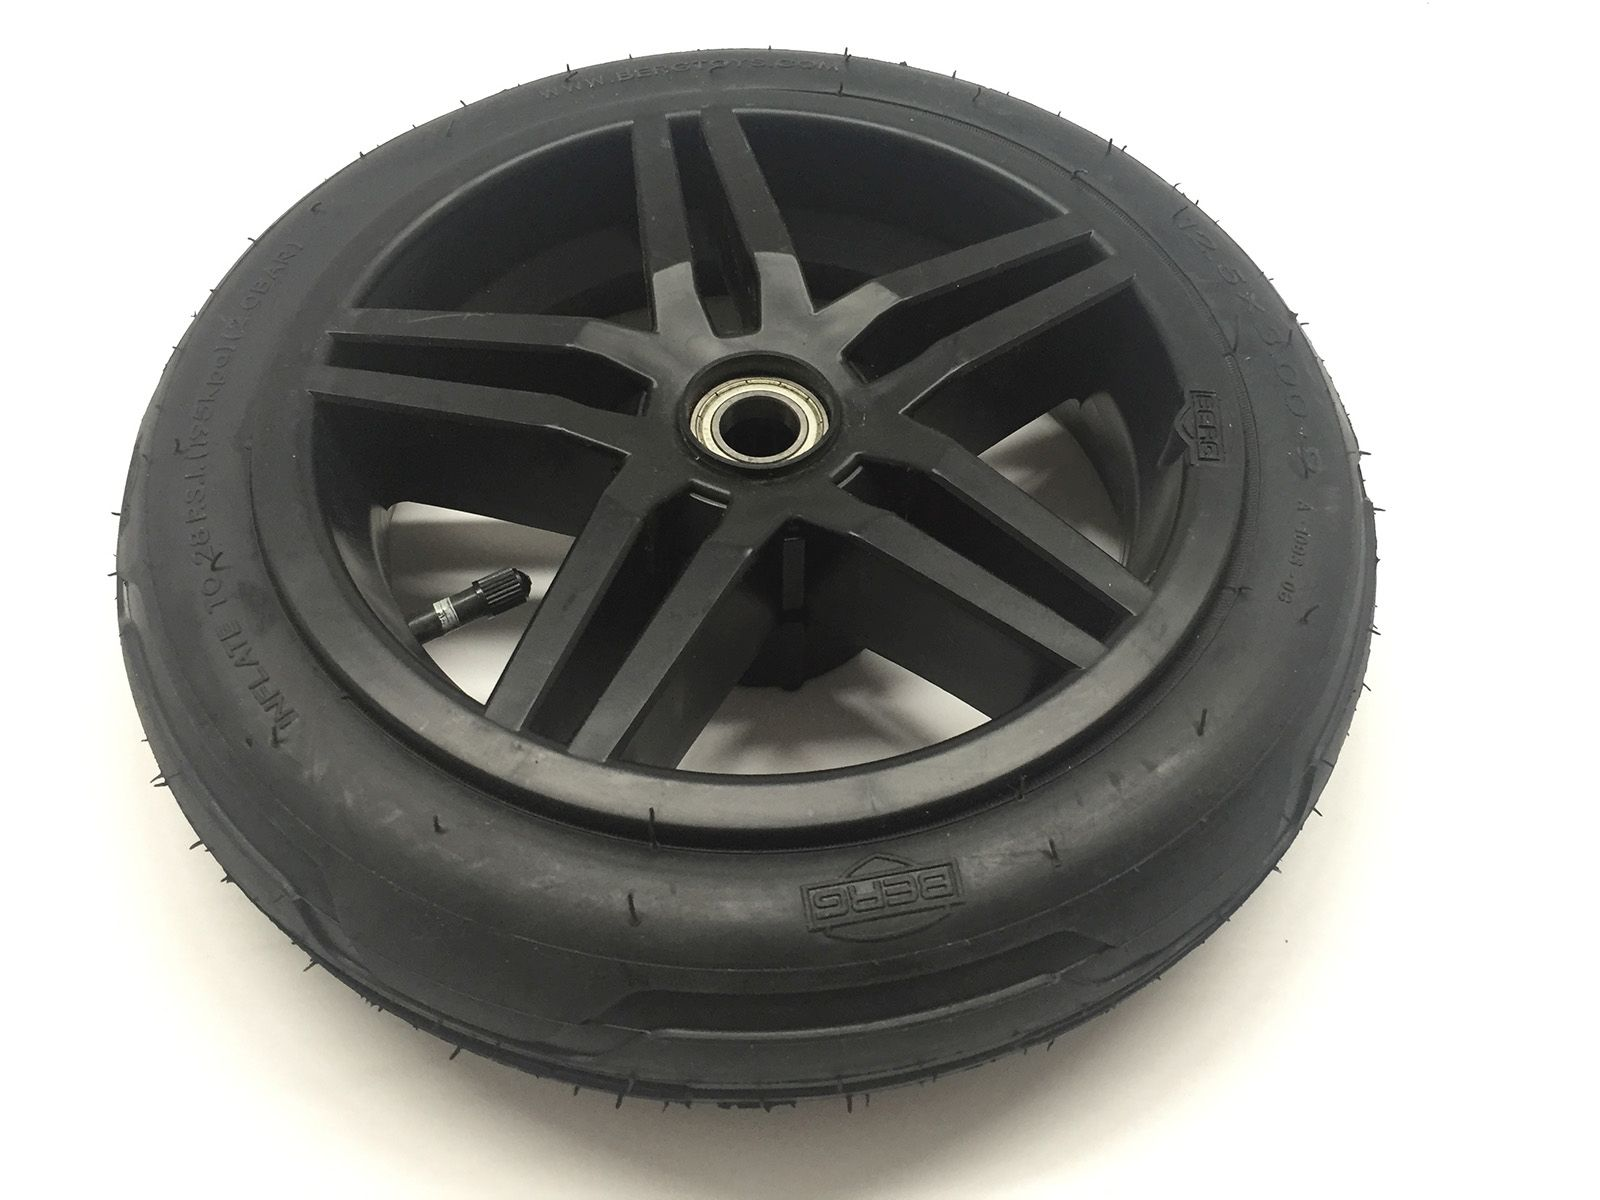 Wheel  black 12.5x3.00-9 slick